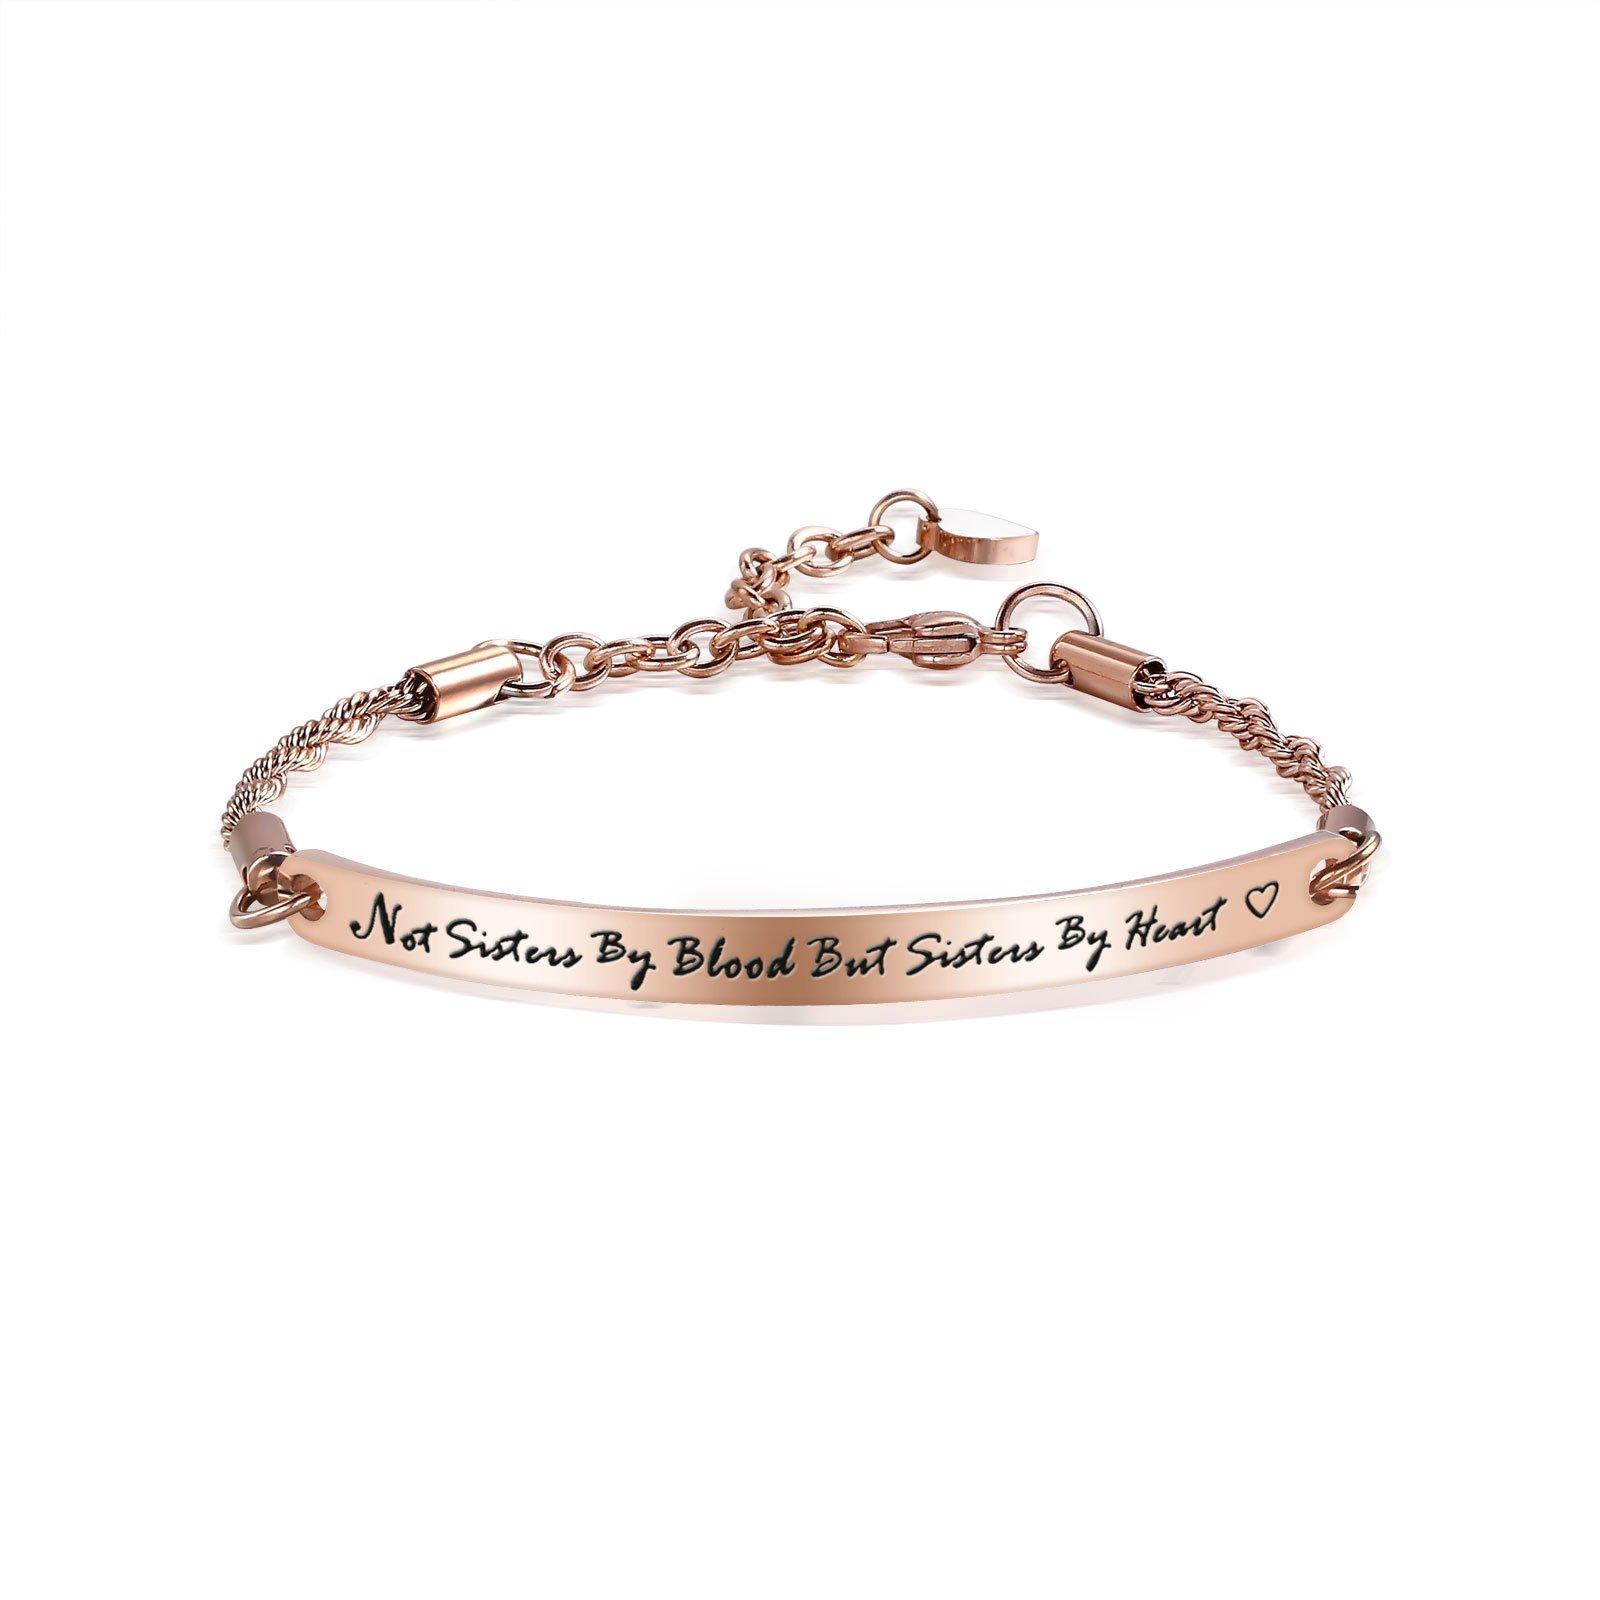 ivyAnan Jewellery Not Sister by Blood But Sister by Heart Bracelet Jewelry Gift For Best Friend Sister Women Girls(sister by heart-rose gold)